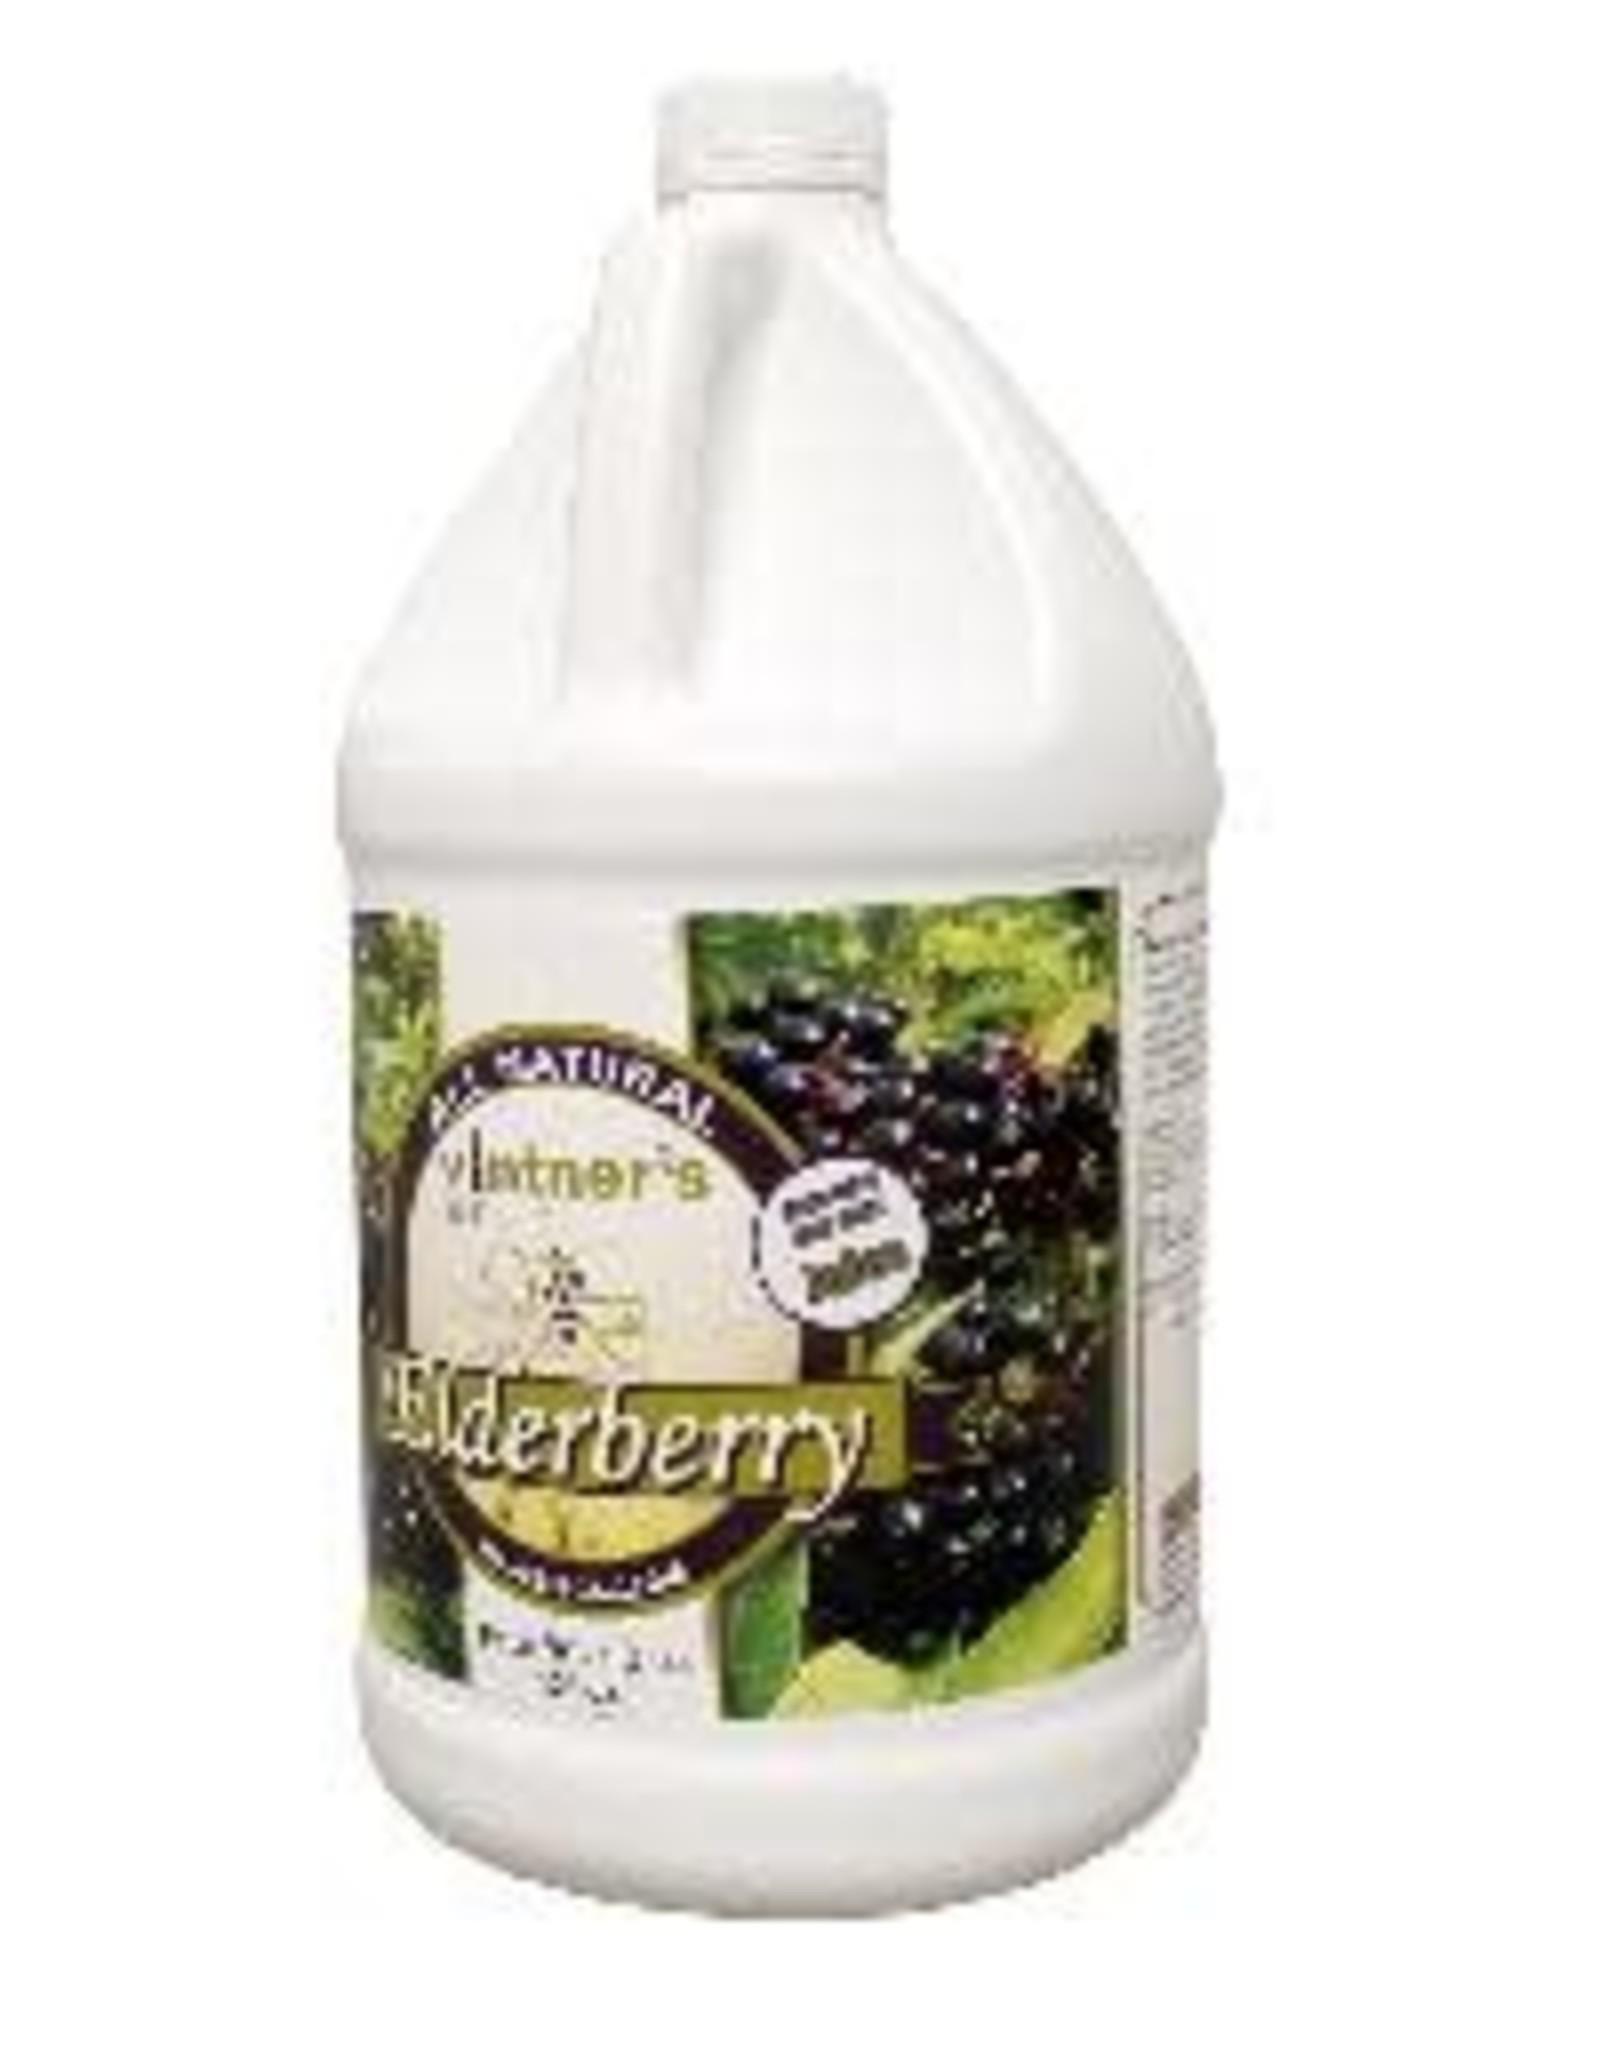 ELDERBERRY FRUIT WINE BASE 128 OZ (1 GAL)